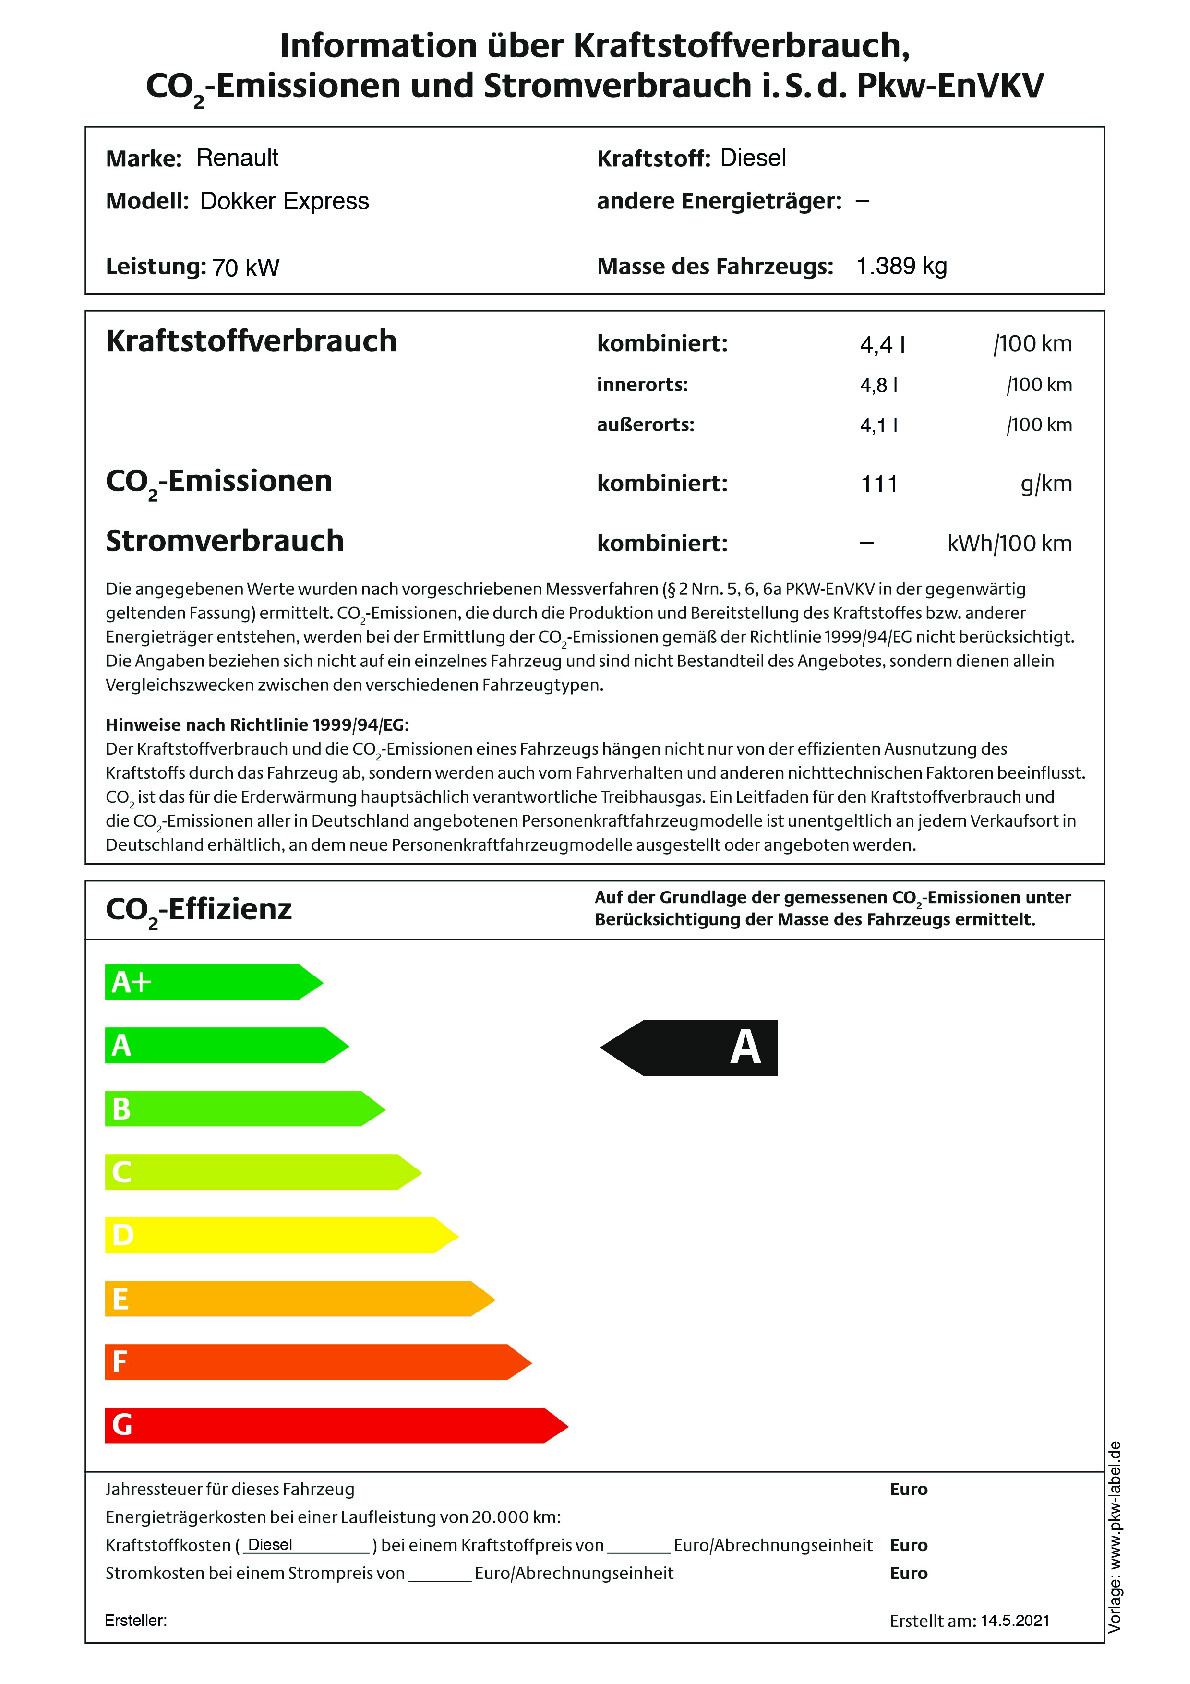 Energielabel 1.5 Blue dCi 95